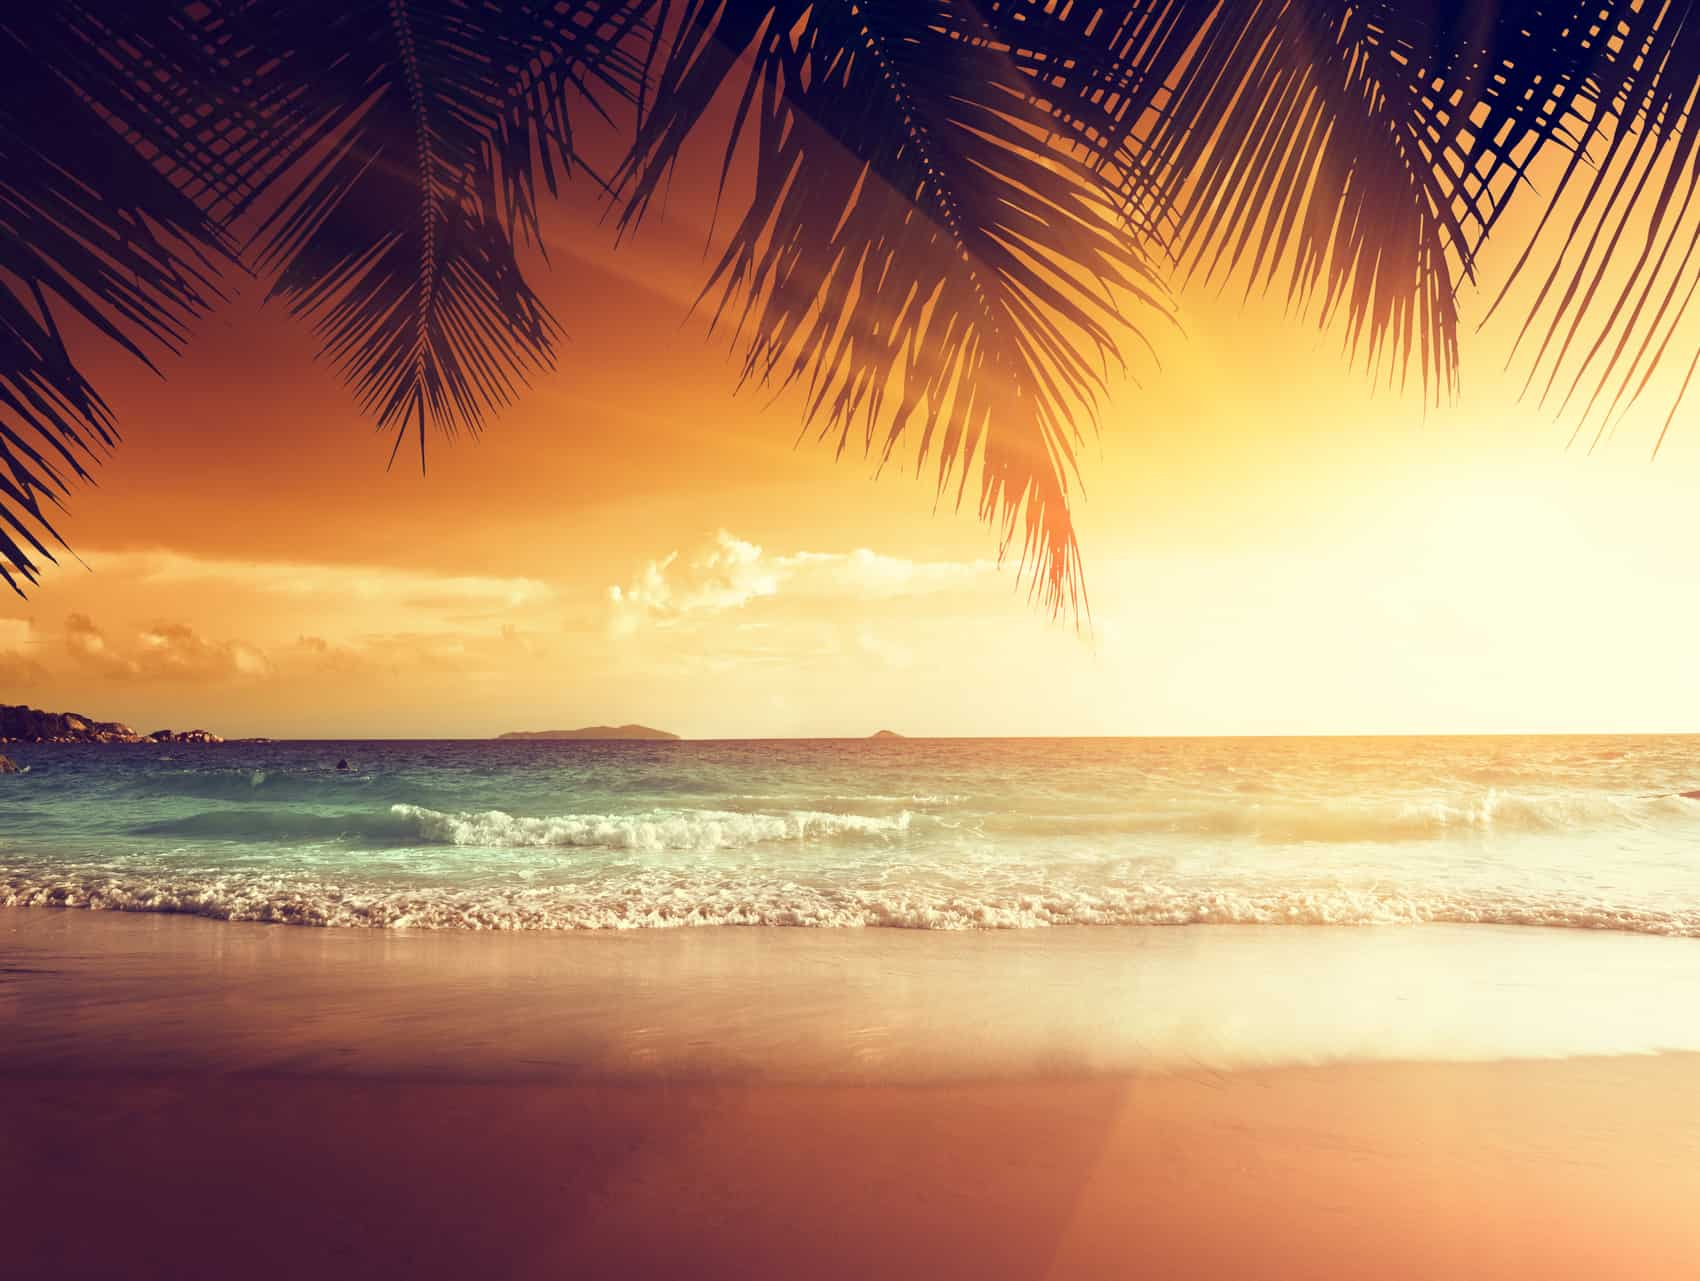 Grenada sunset on the beach of caribbean sea